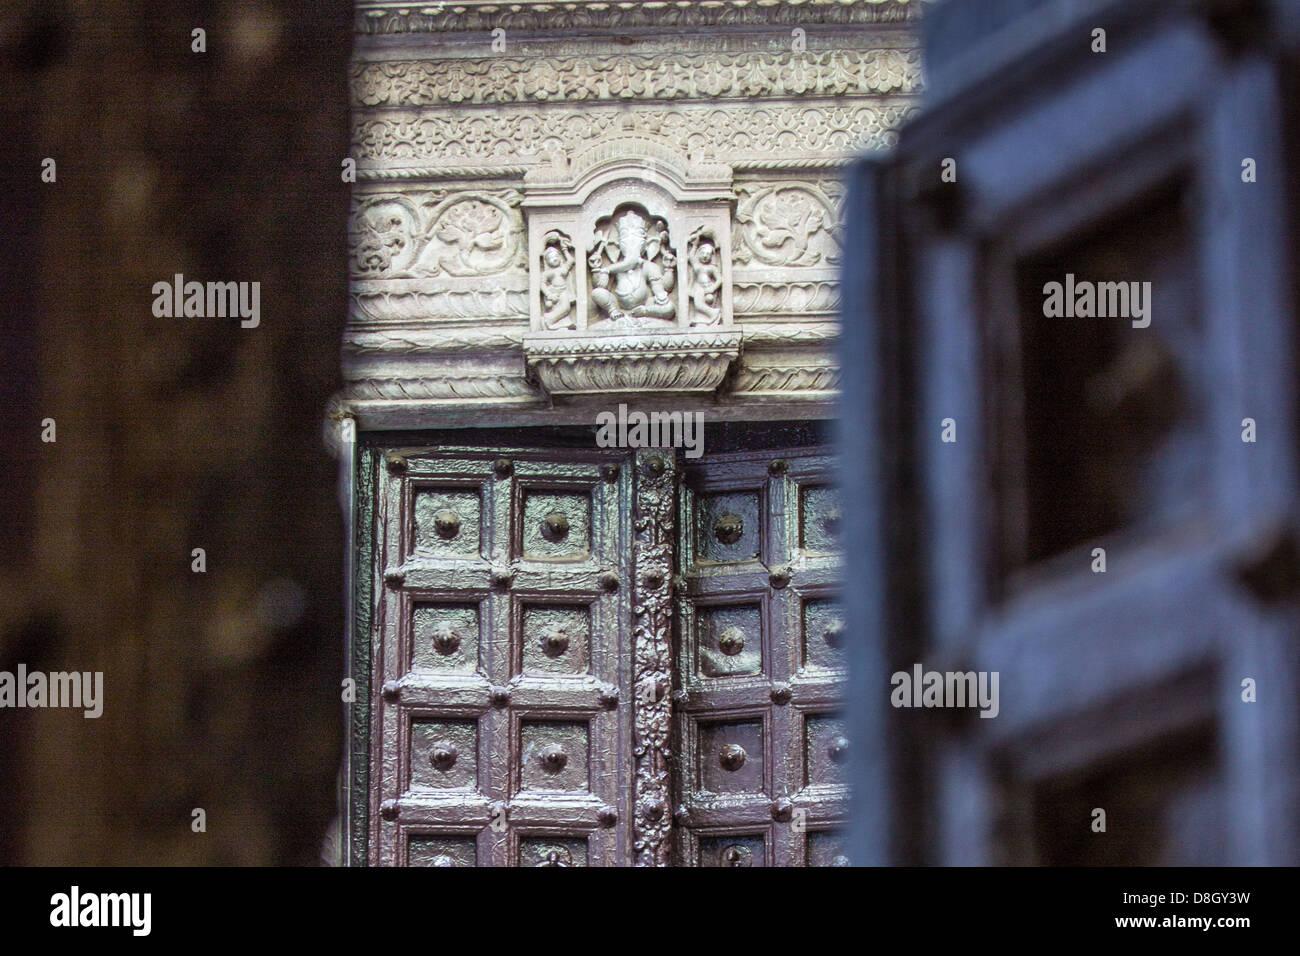 Entrée d'un temple hindou à Varanasi, Inde Photo Stock